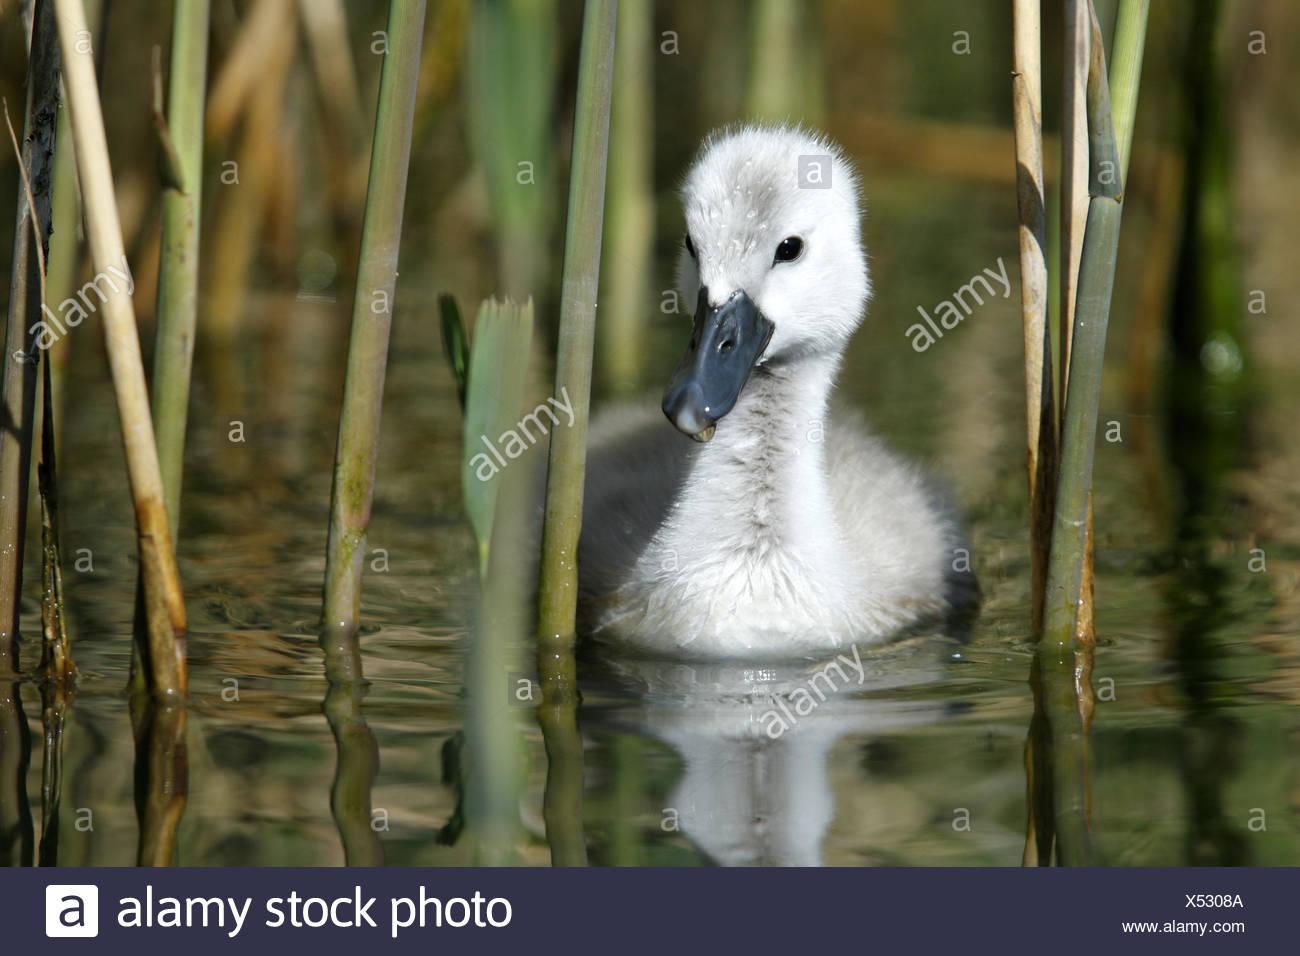 Pond, hump swan, Cygnus olor, fledglings, swim, pool, water, animal baby, animal, bird species, duck's birds, swans, swan fledglings, down, reed, Reflection, nature, - Stock Image